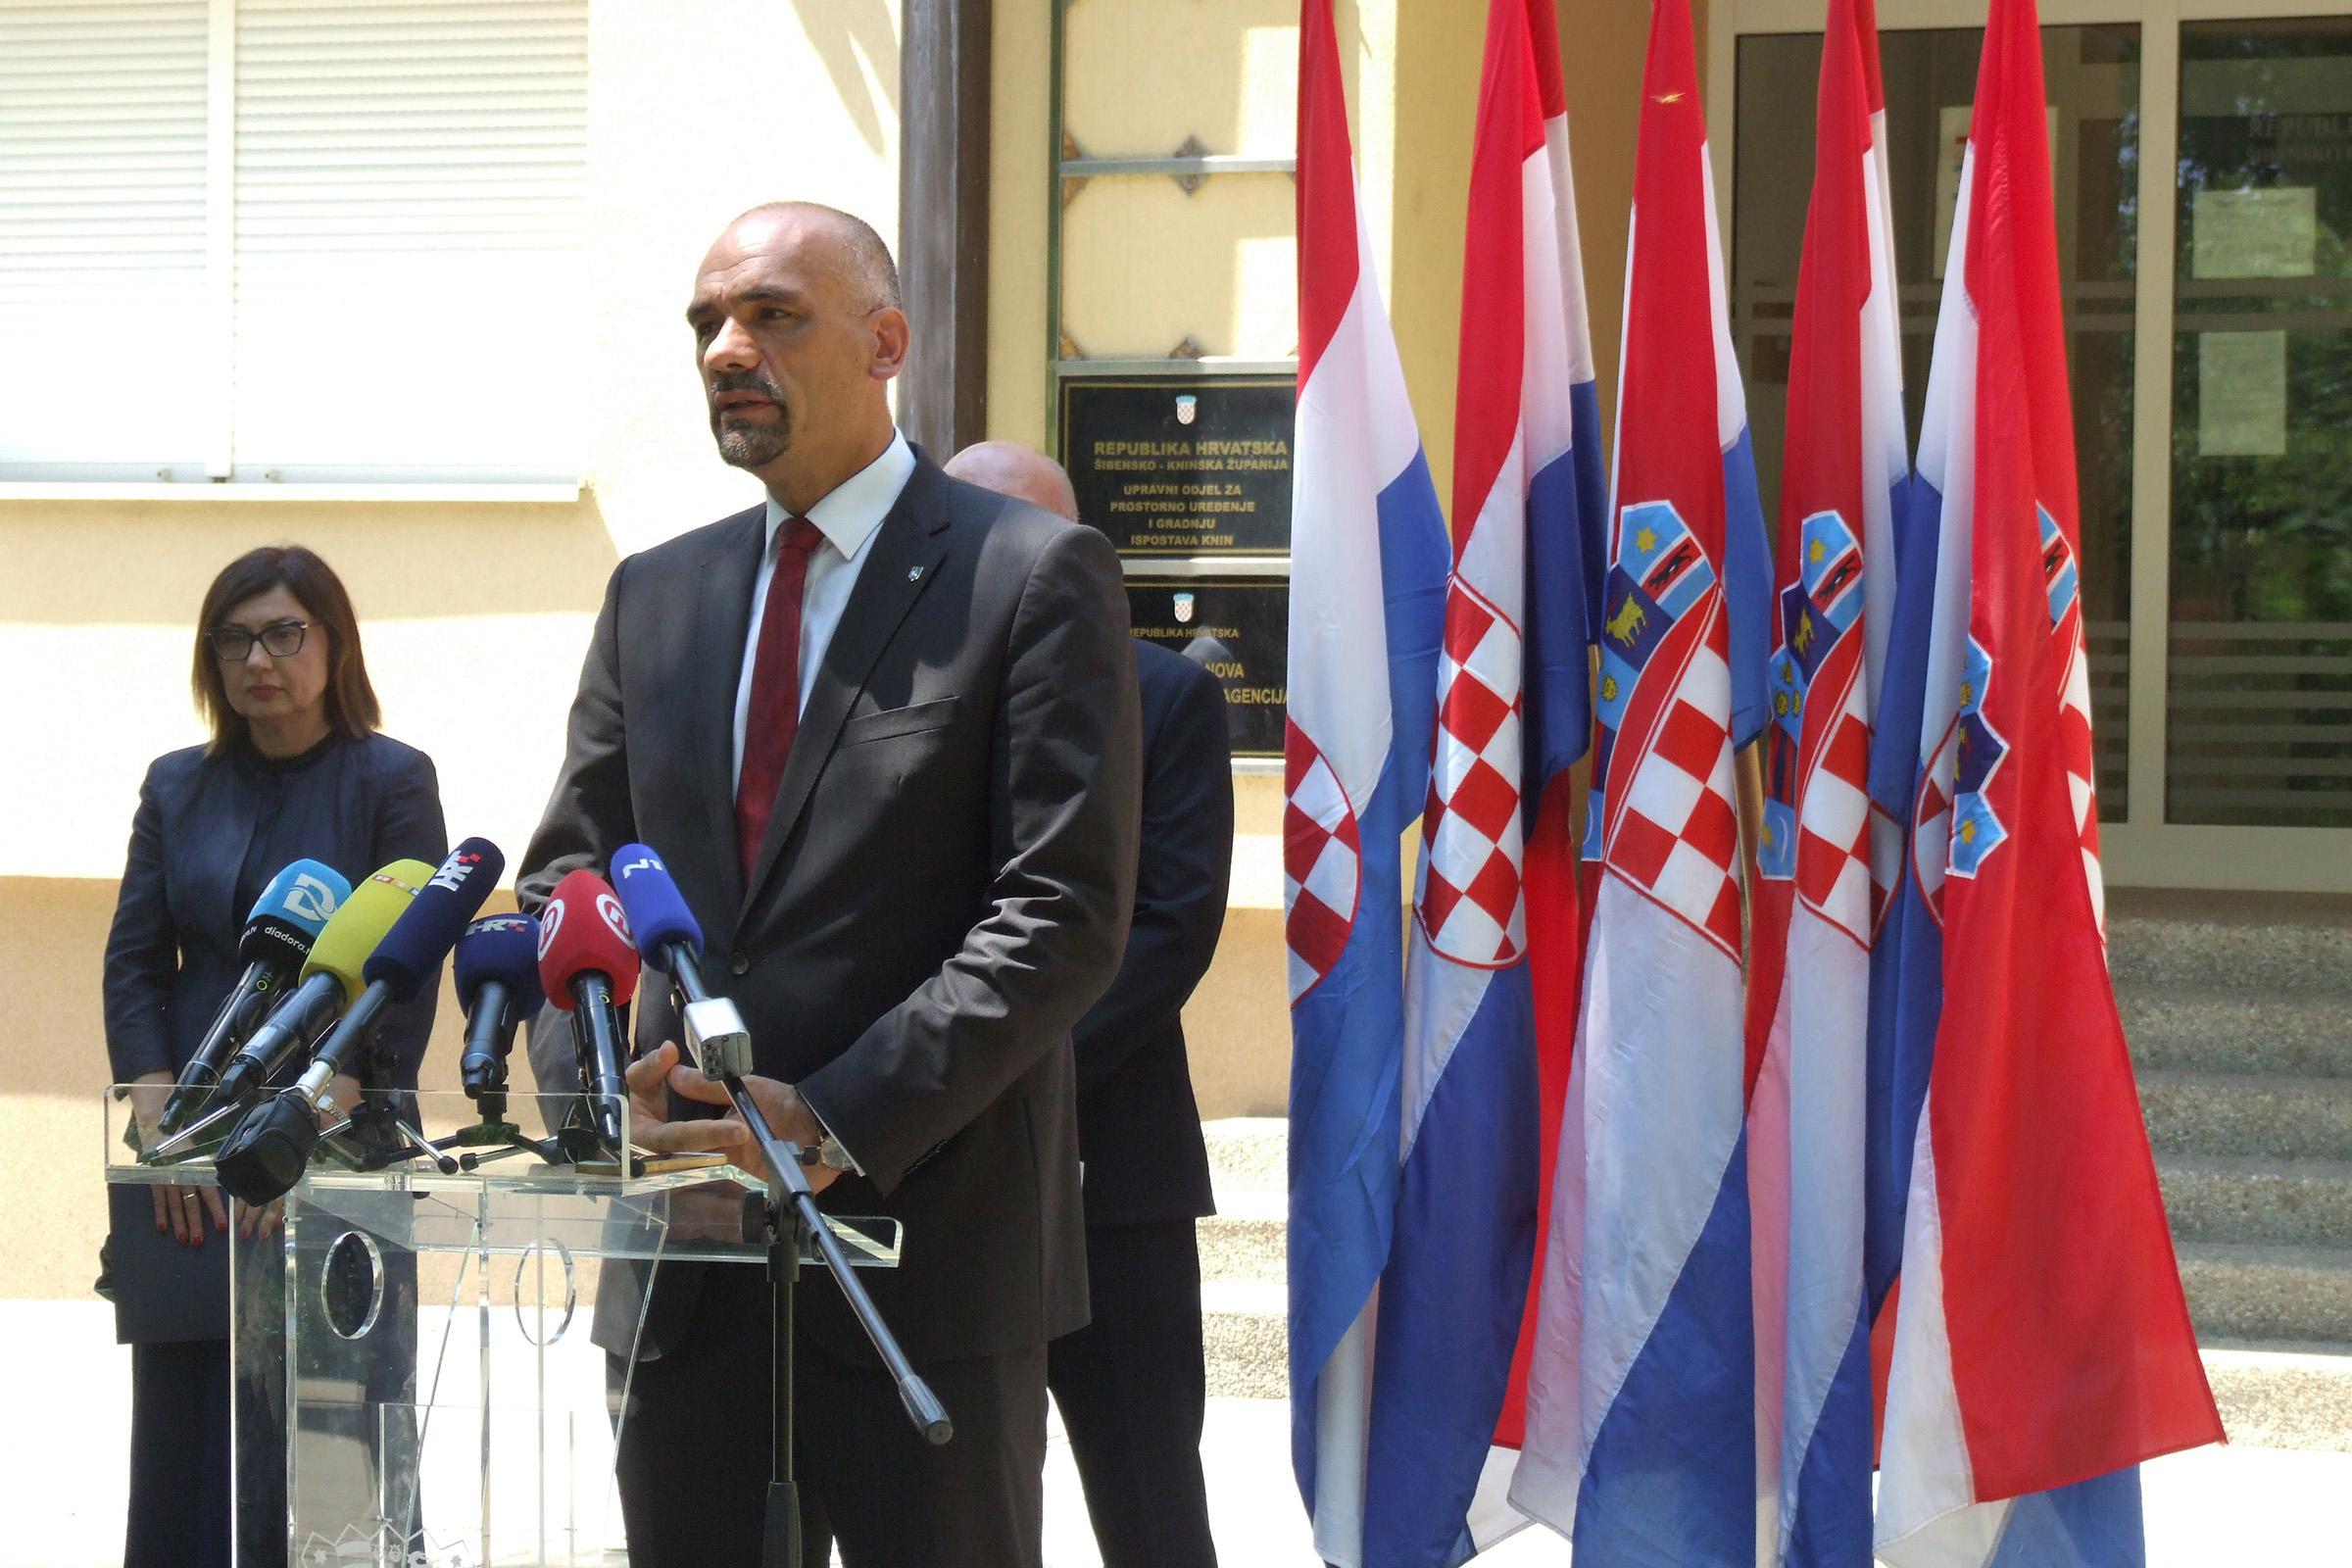 U Kninu održana konferencija za medije povodom obilježavanja 25. obljetnice VRO Oluja